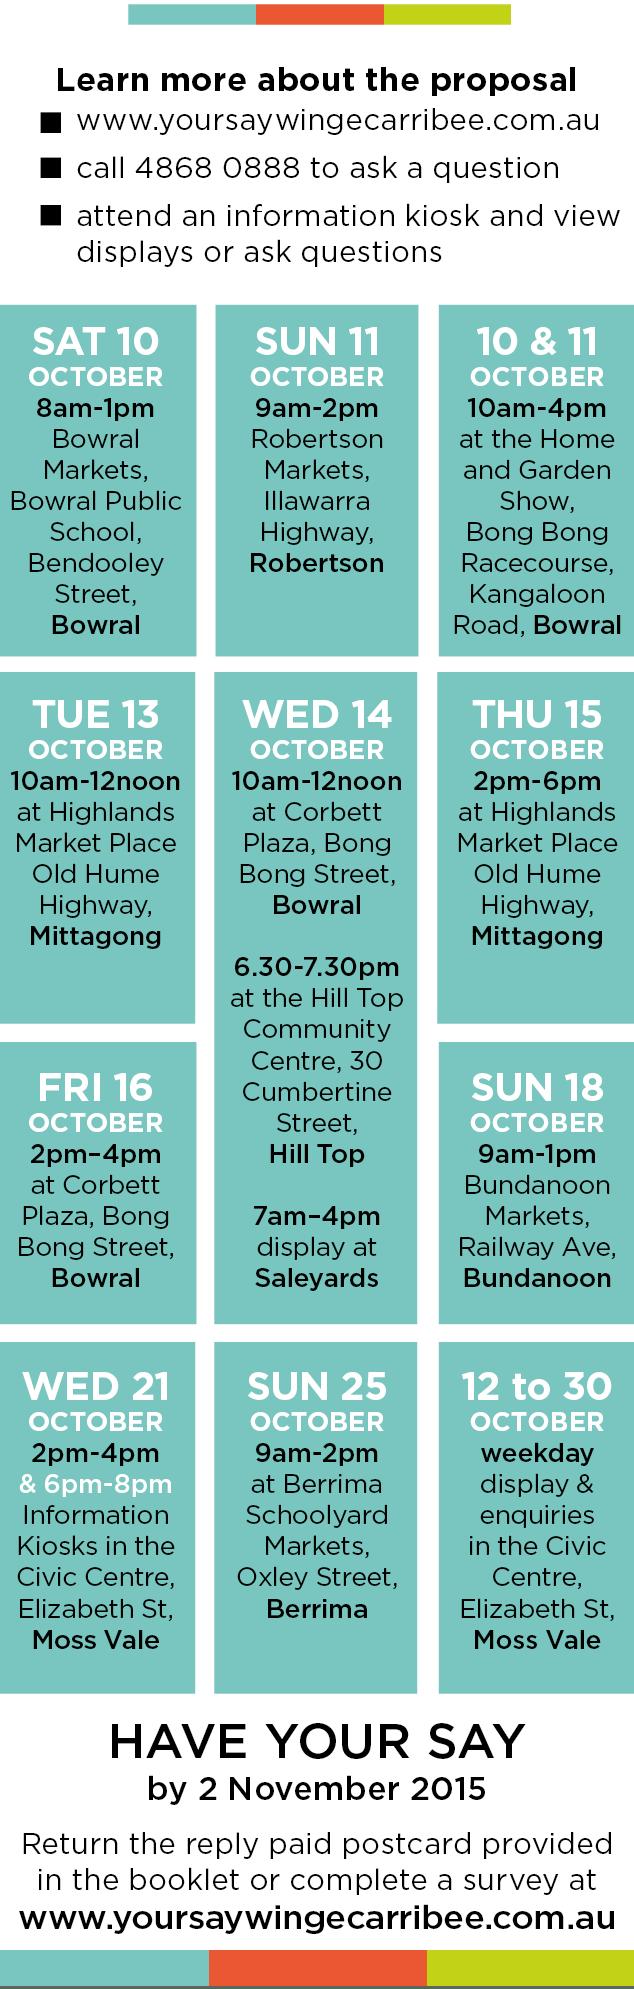 Calendar of Info Kiosk locations